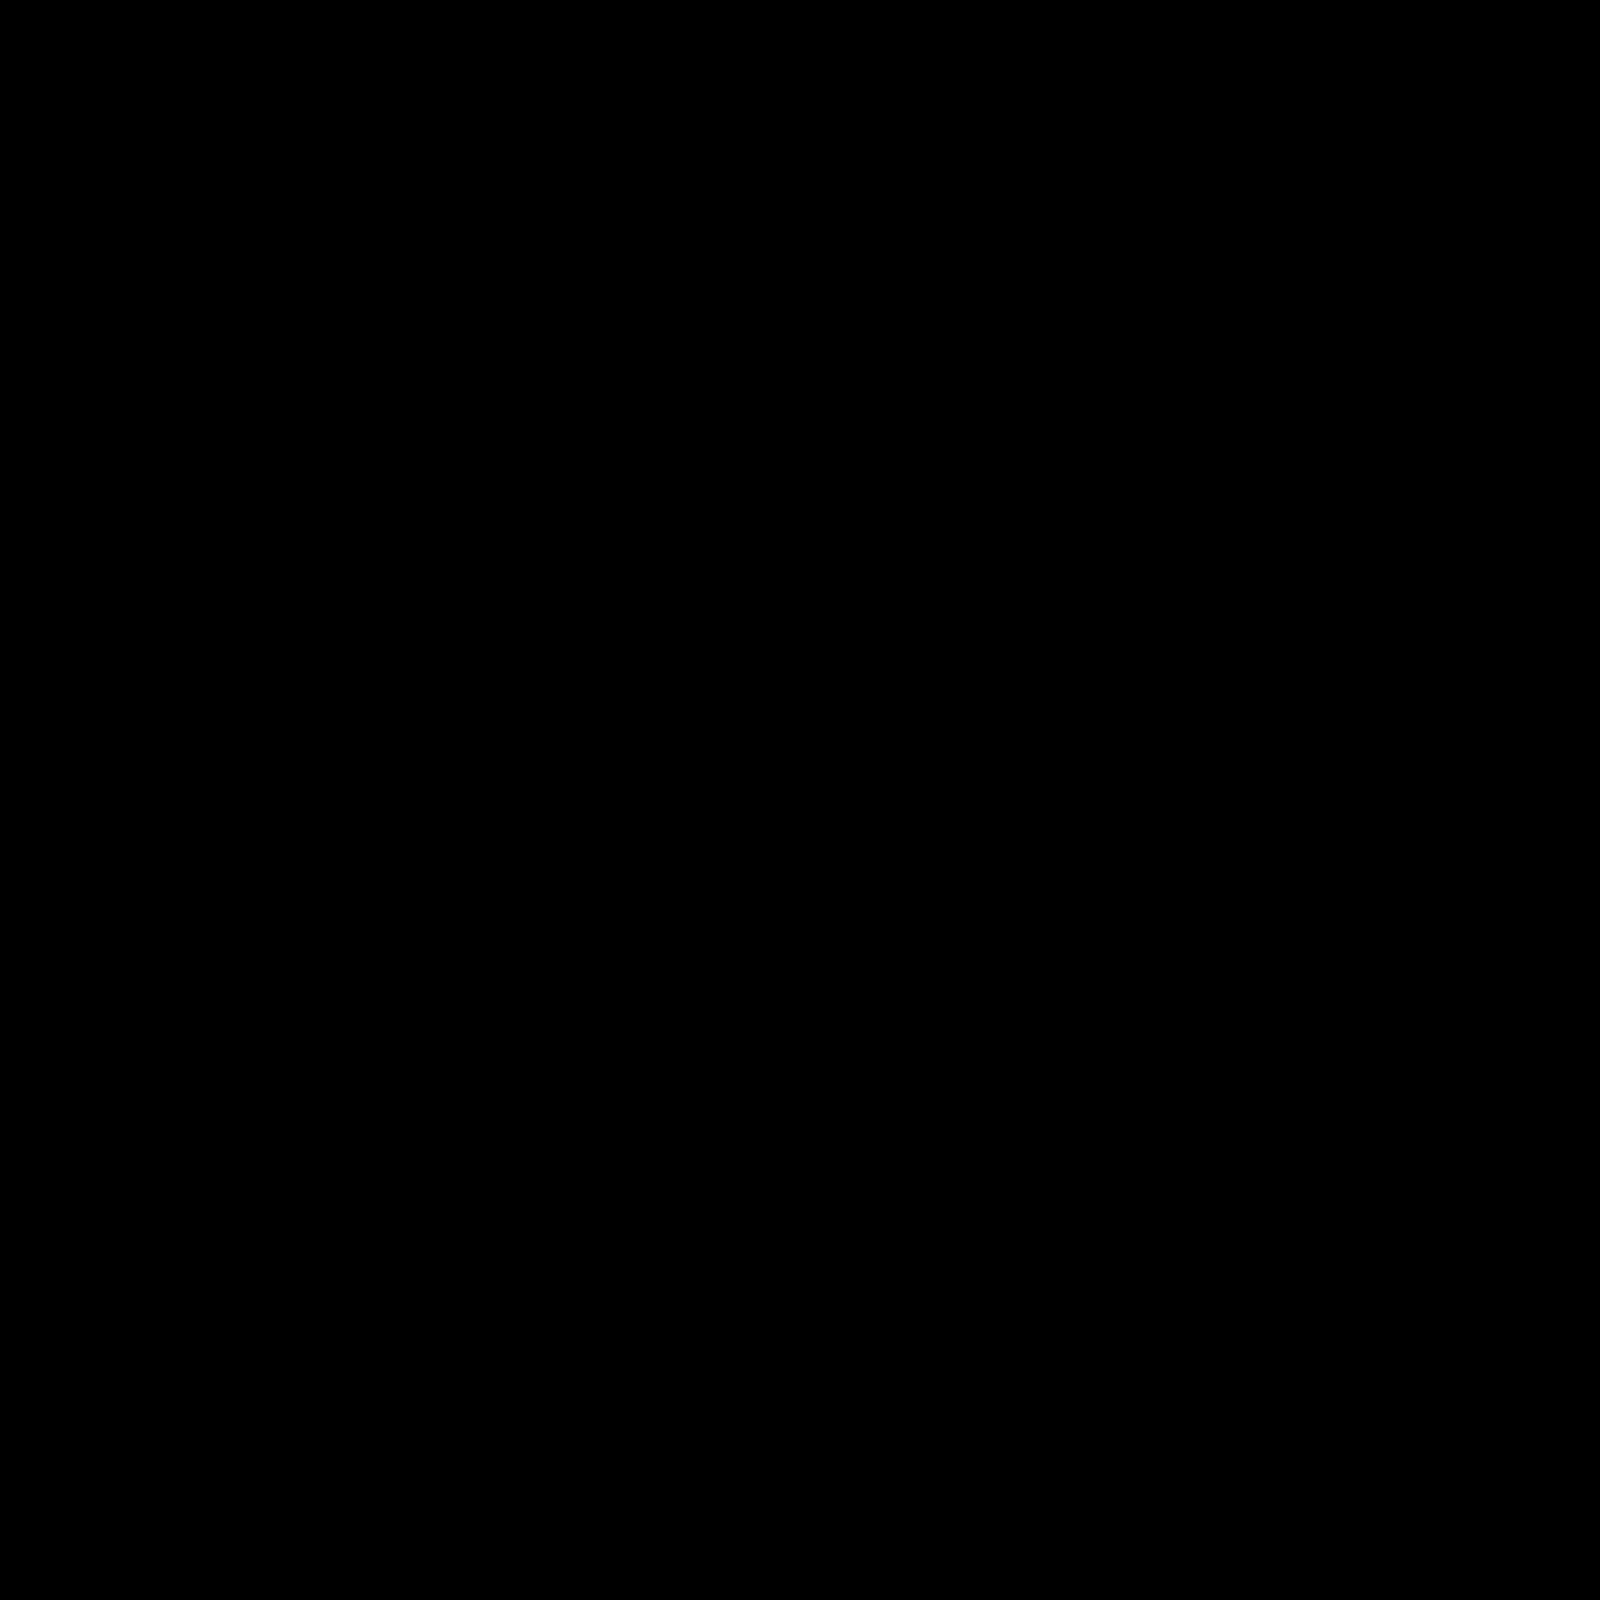 Silhouette clip art at. Paw clipart german shepherd